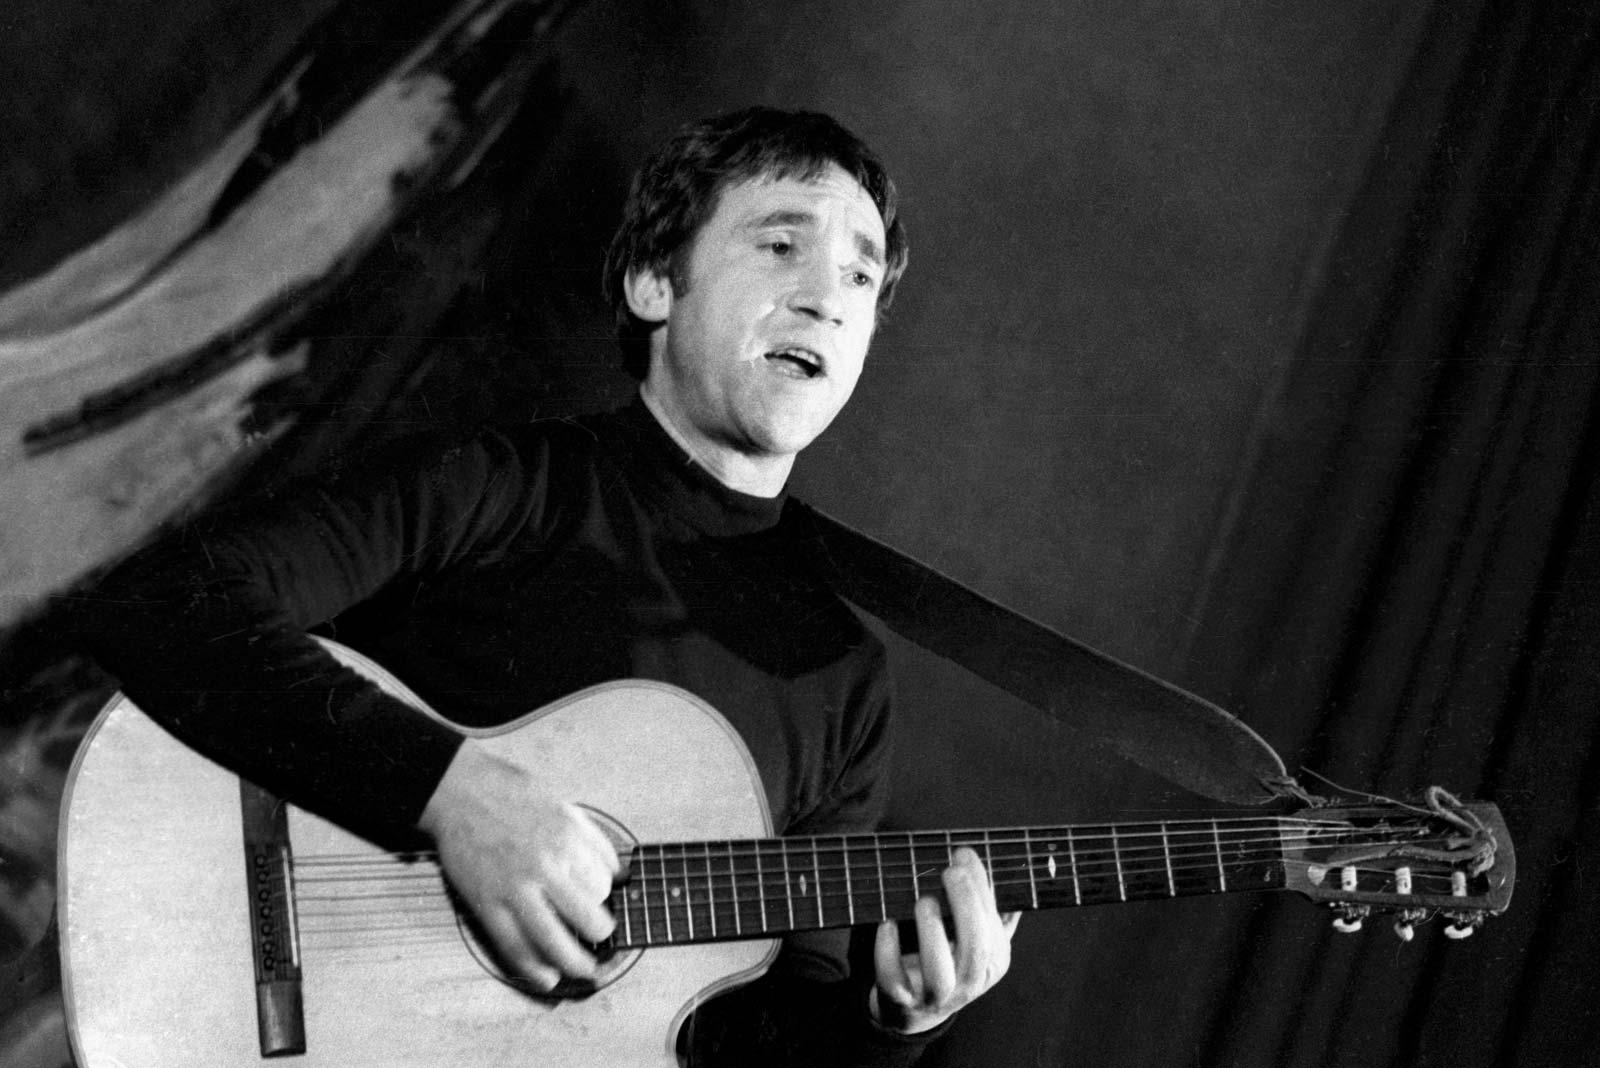 Penyanyi Serba Bisa Vladimir Semenovich Vysotsky